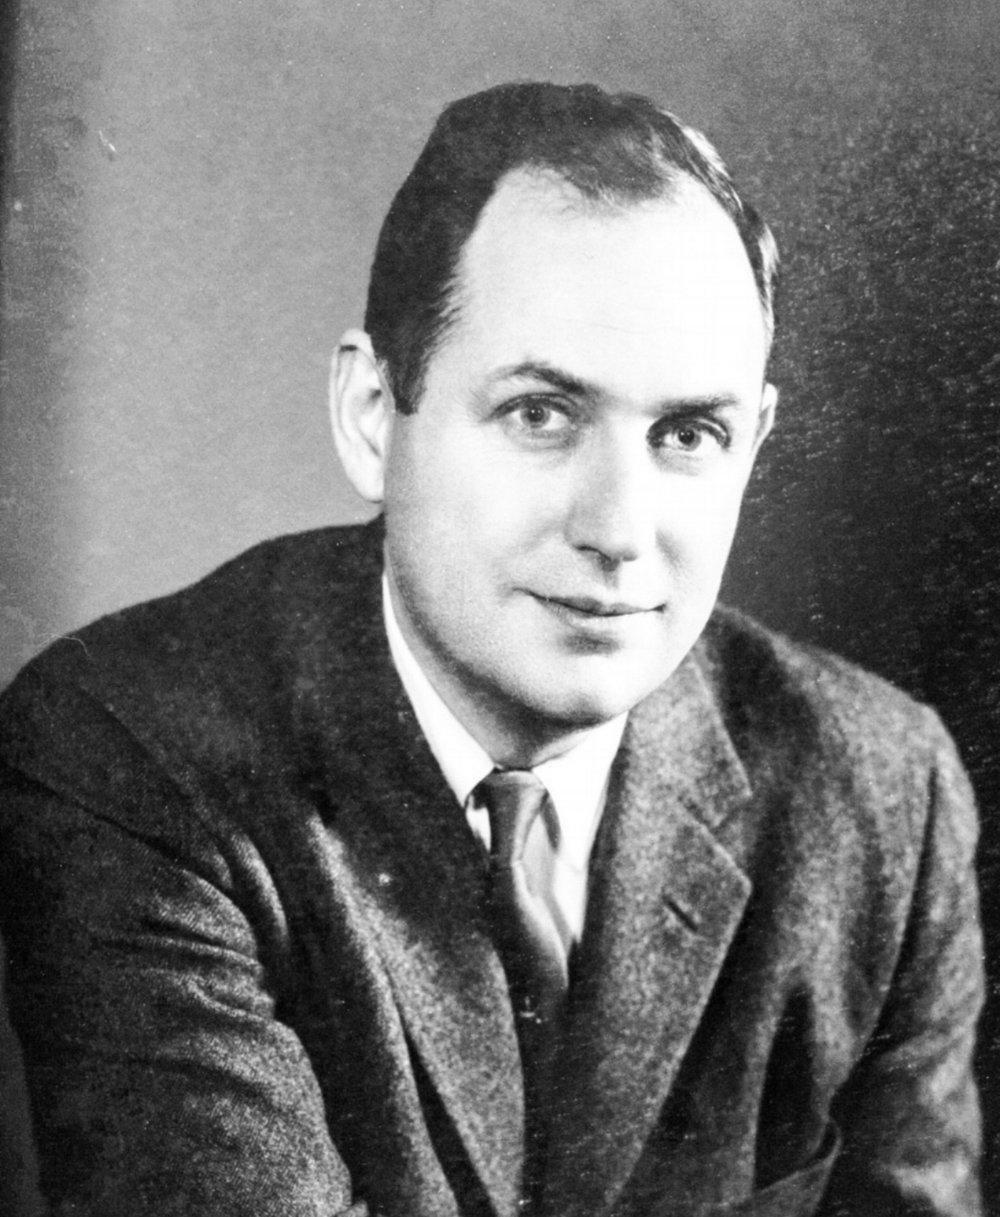 SON, DR. THEODORE DUNCAN, born 1928